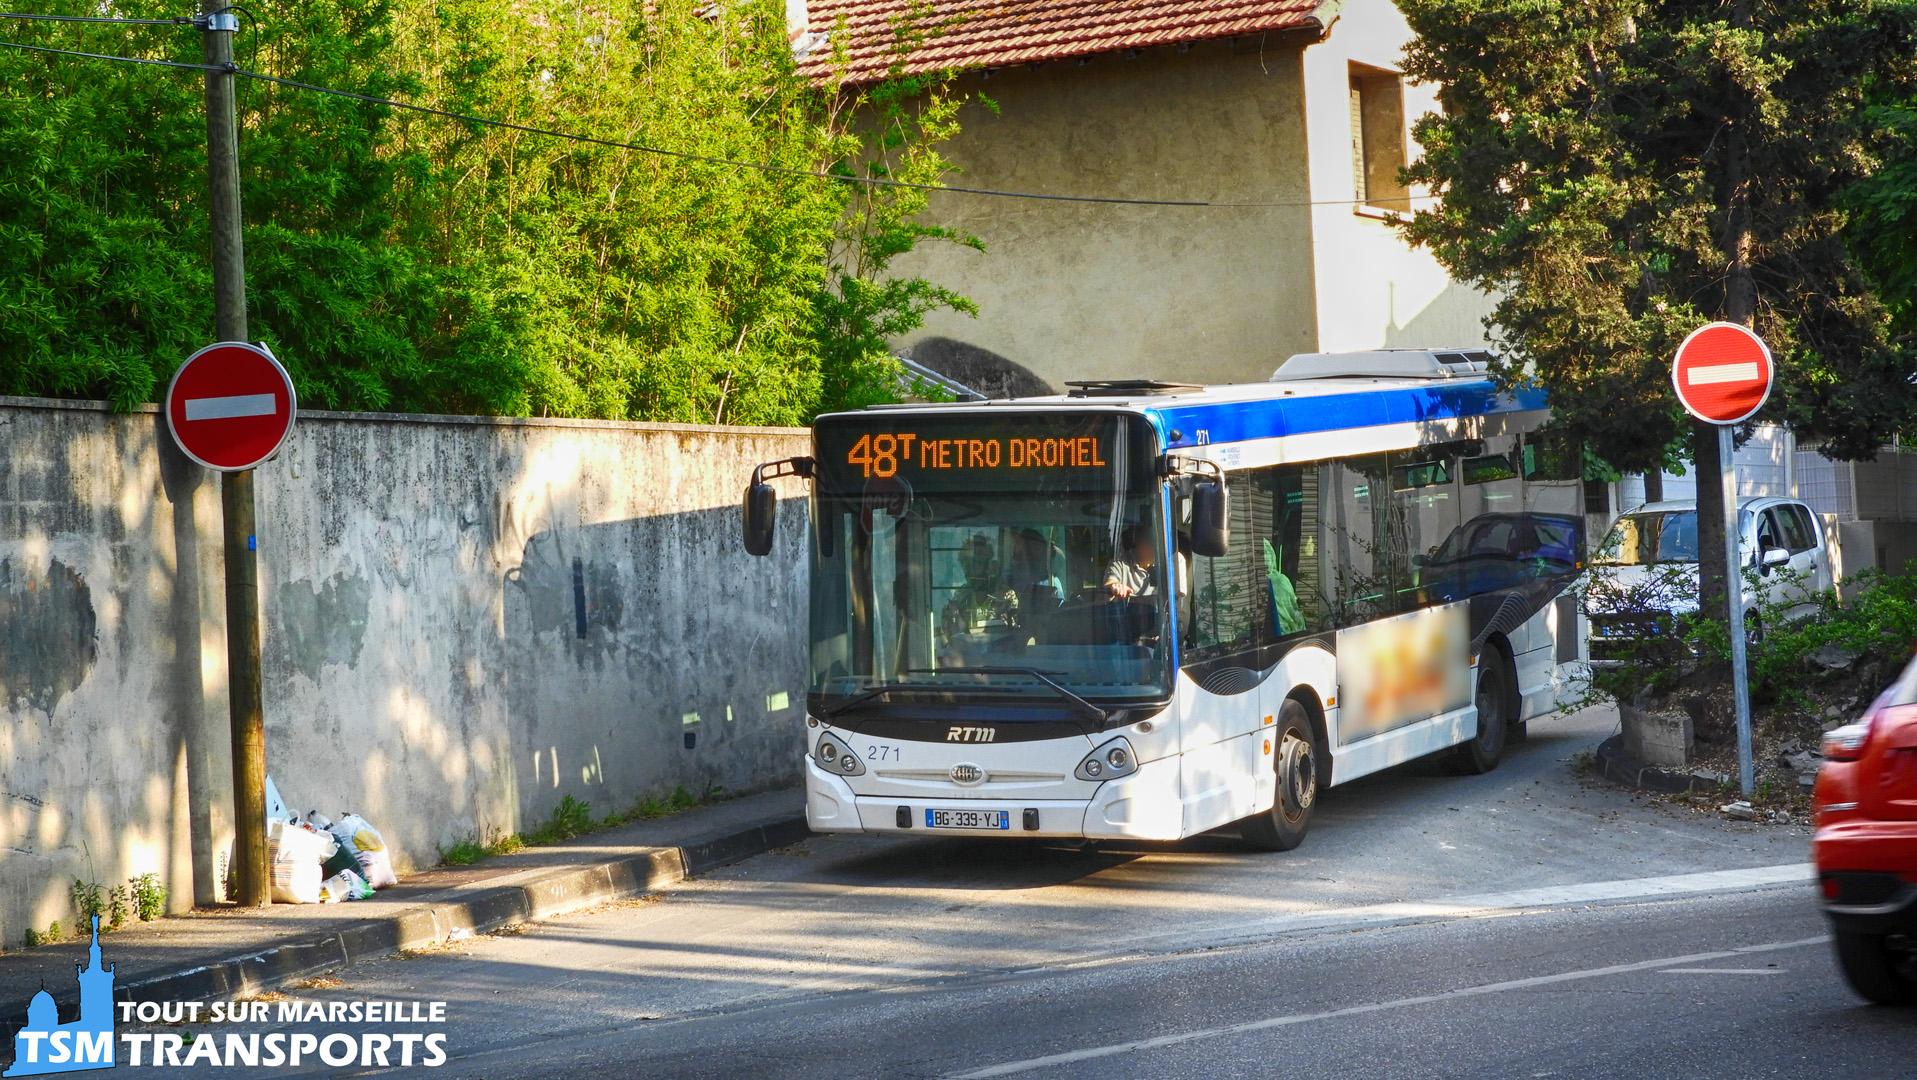 Heuliez Bus GX 127 RTM n°271